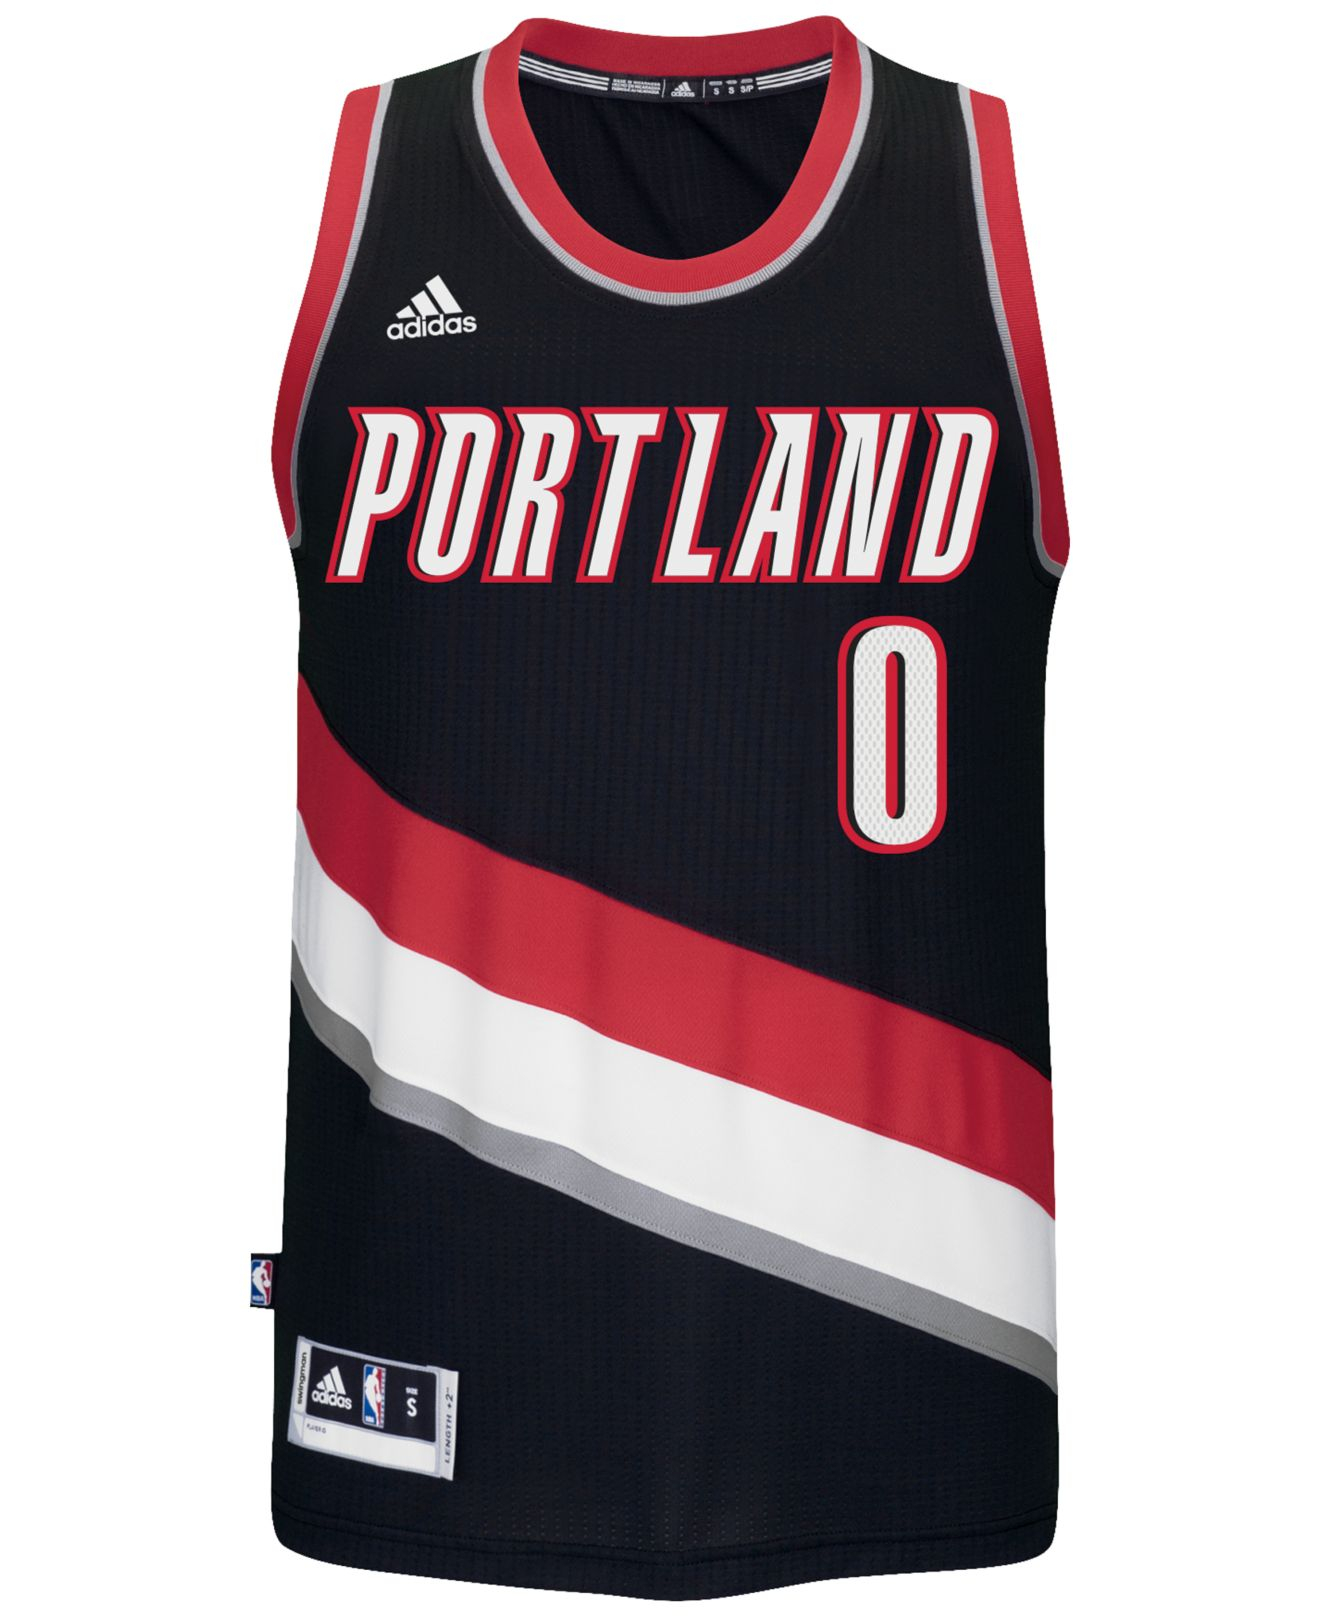 Portland Trail Blazers Jersey: Adidas Originals Men's Damian Lillard Portland Trail